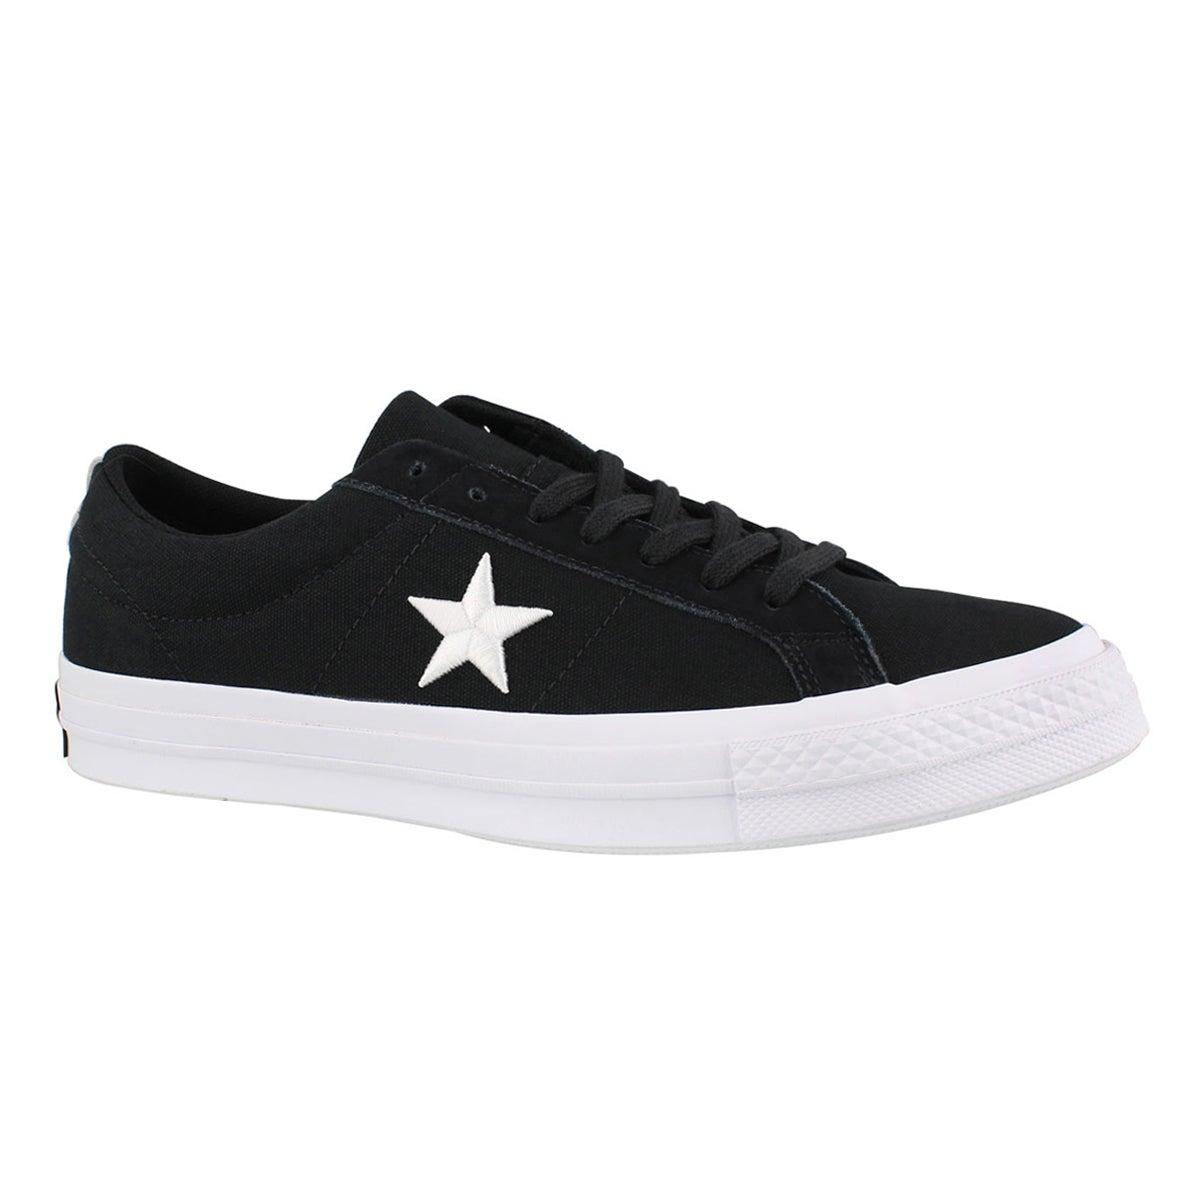 Men's ONE STAR black/white fashion sneakers